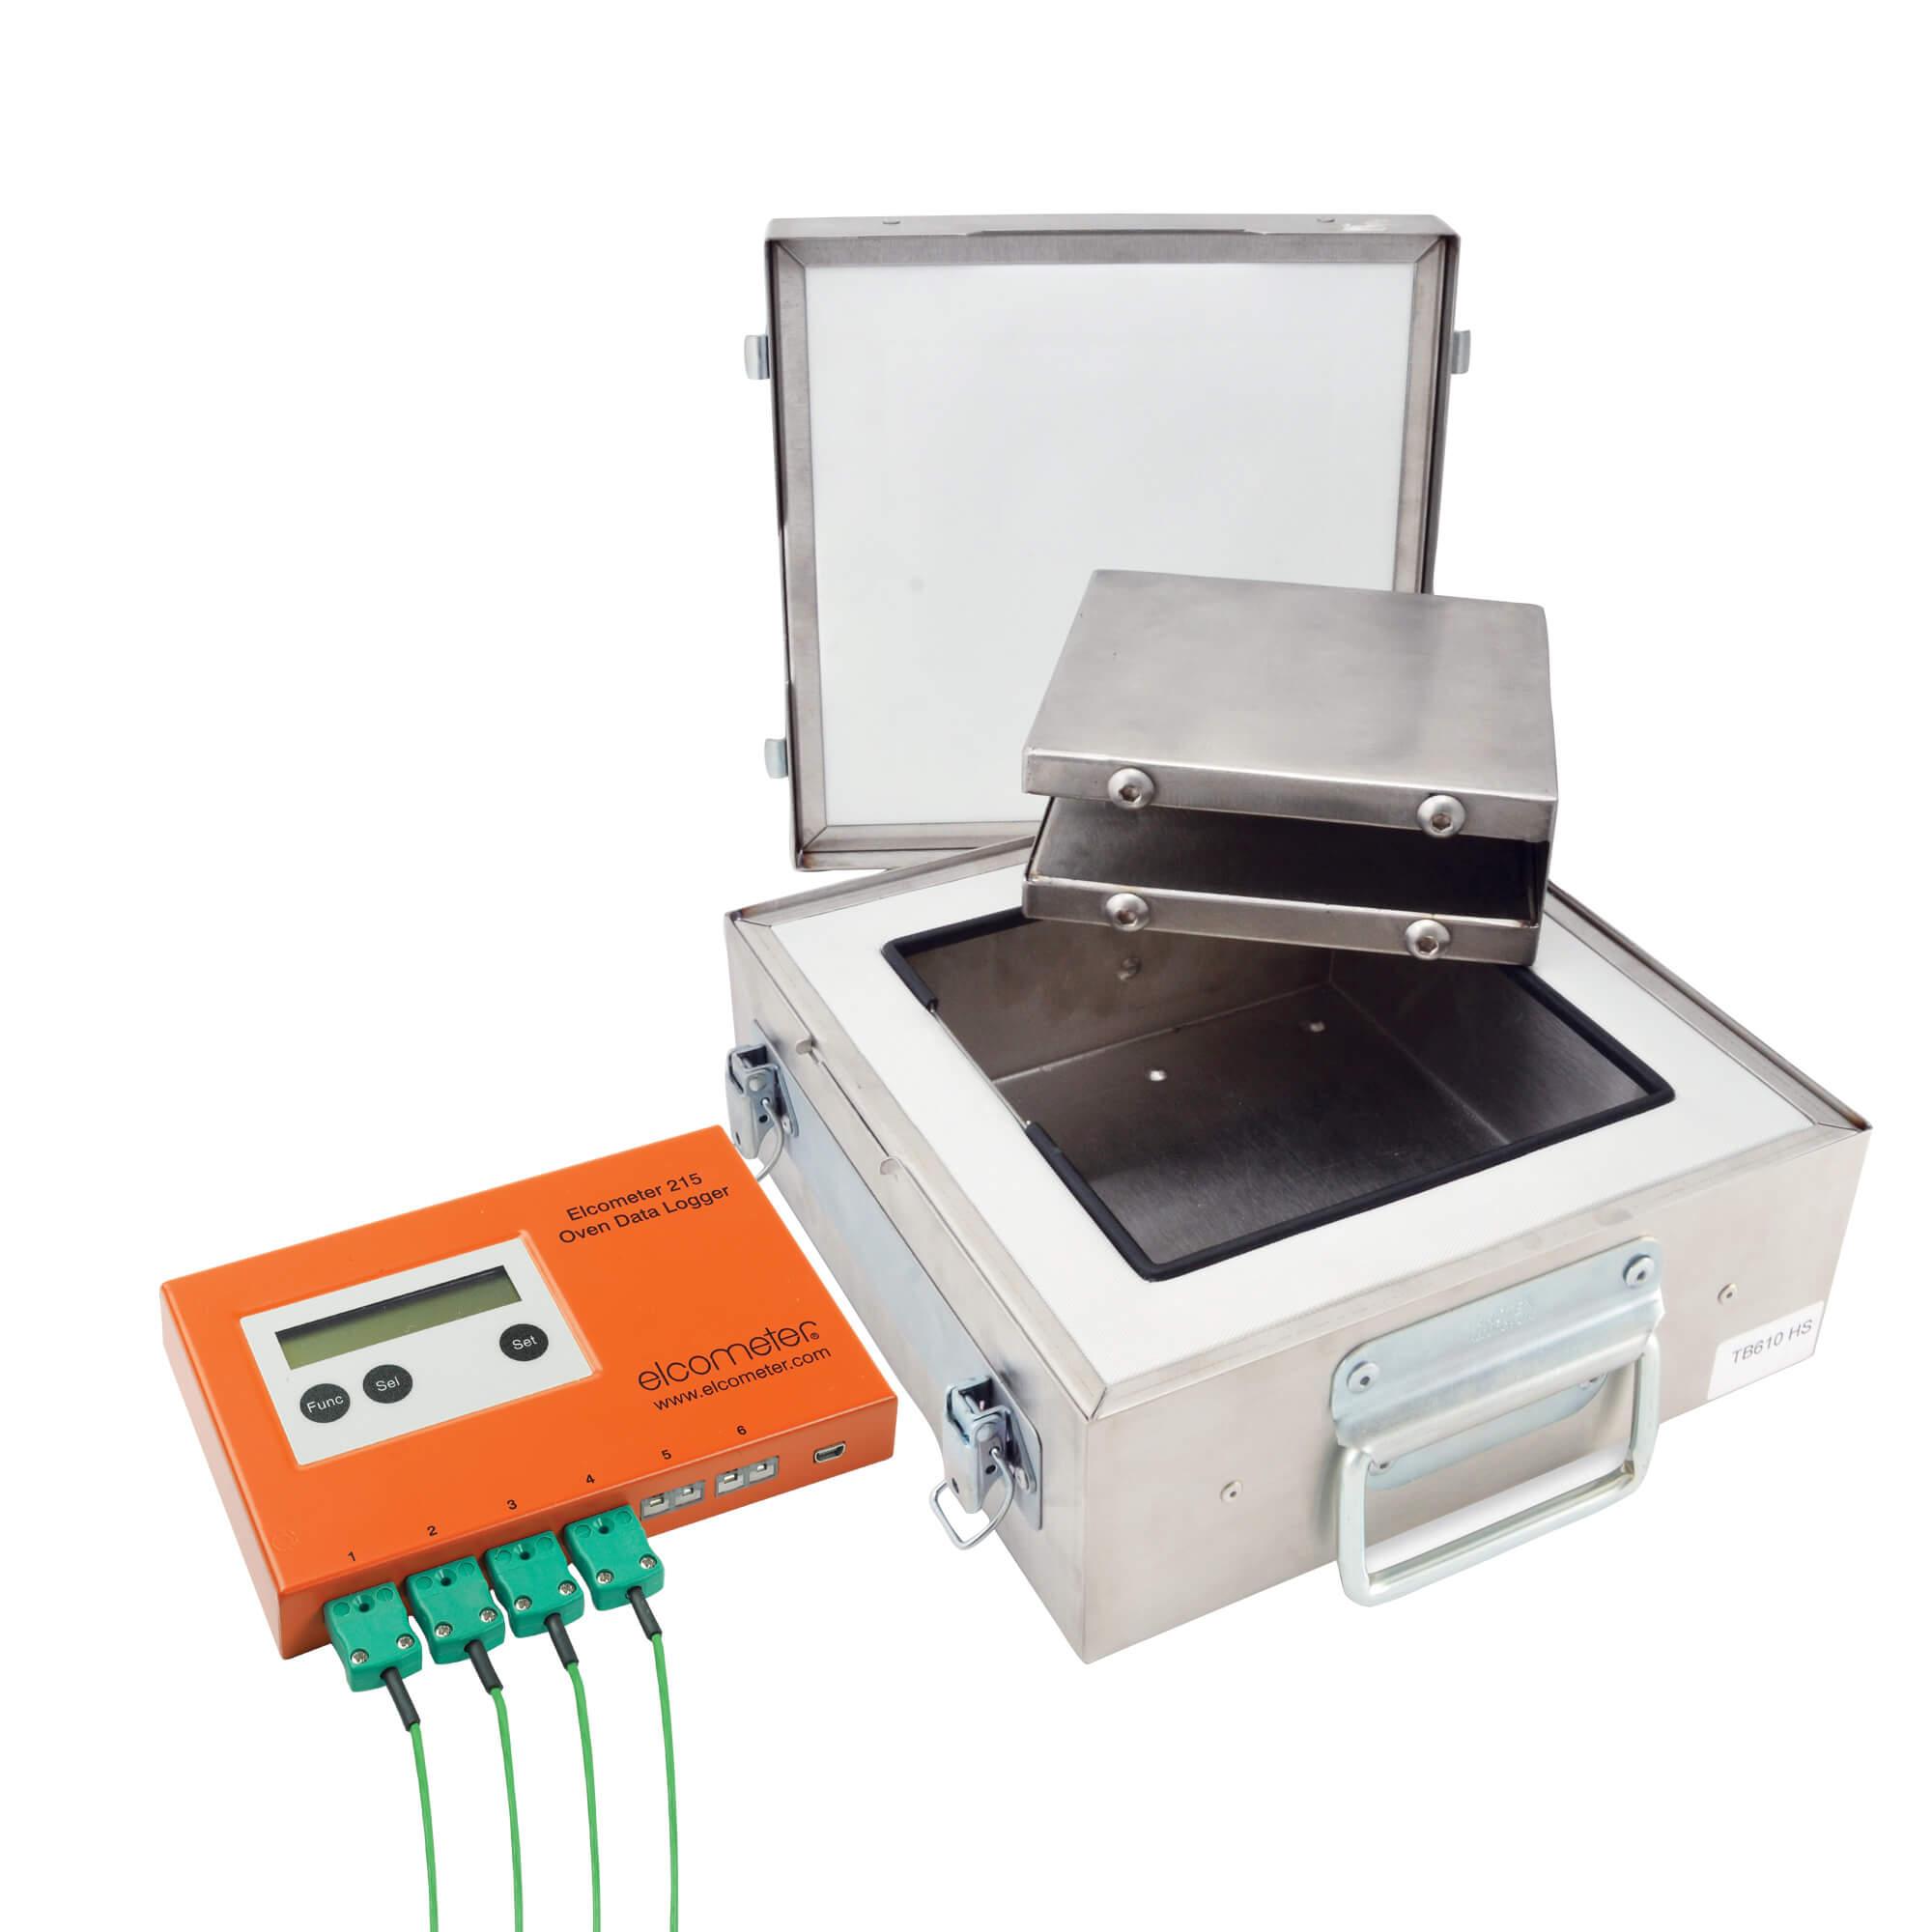 Elcometer 215 Oven Data Logger - ProQuip